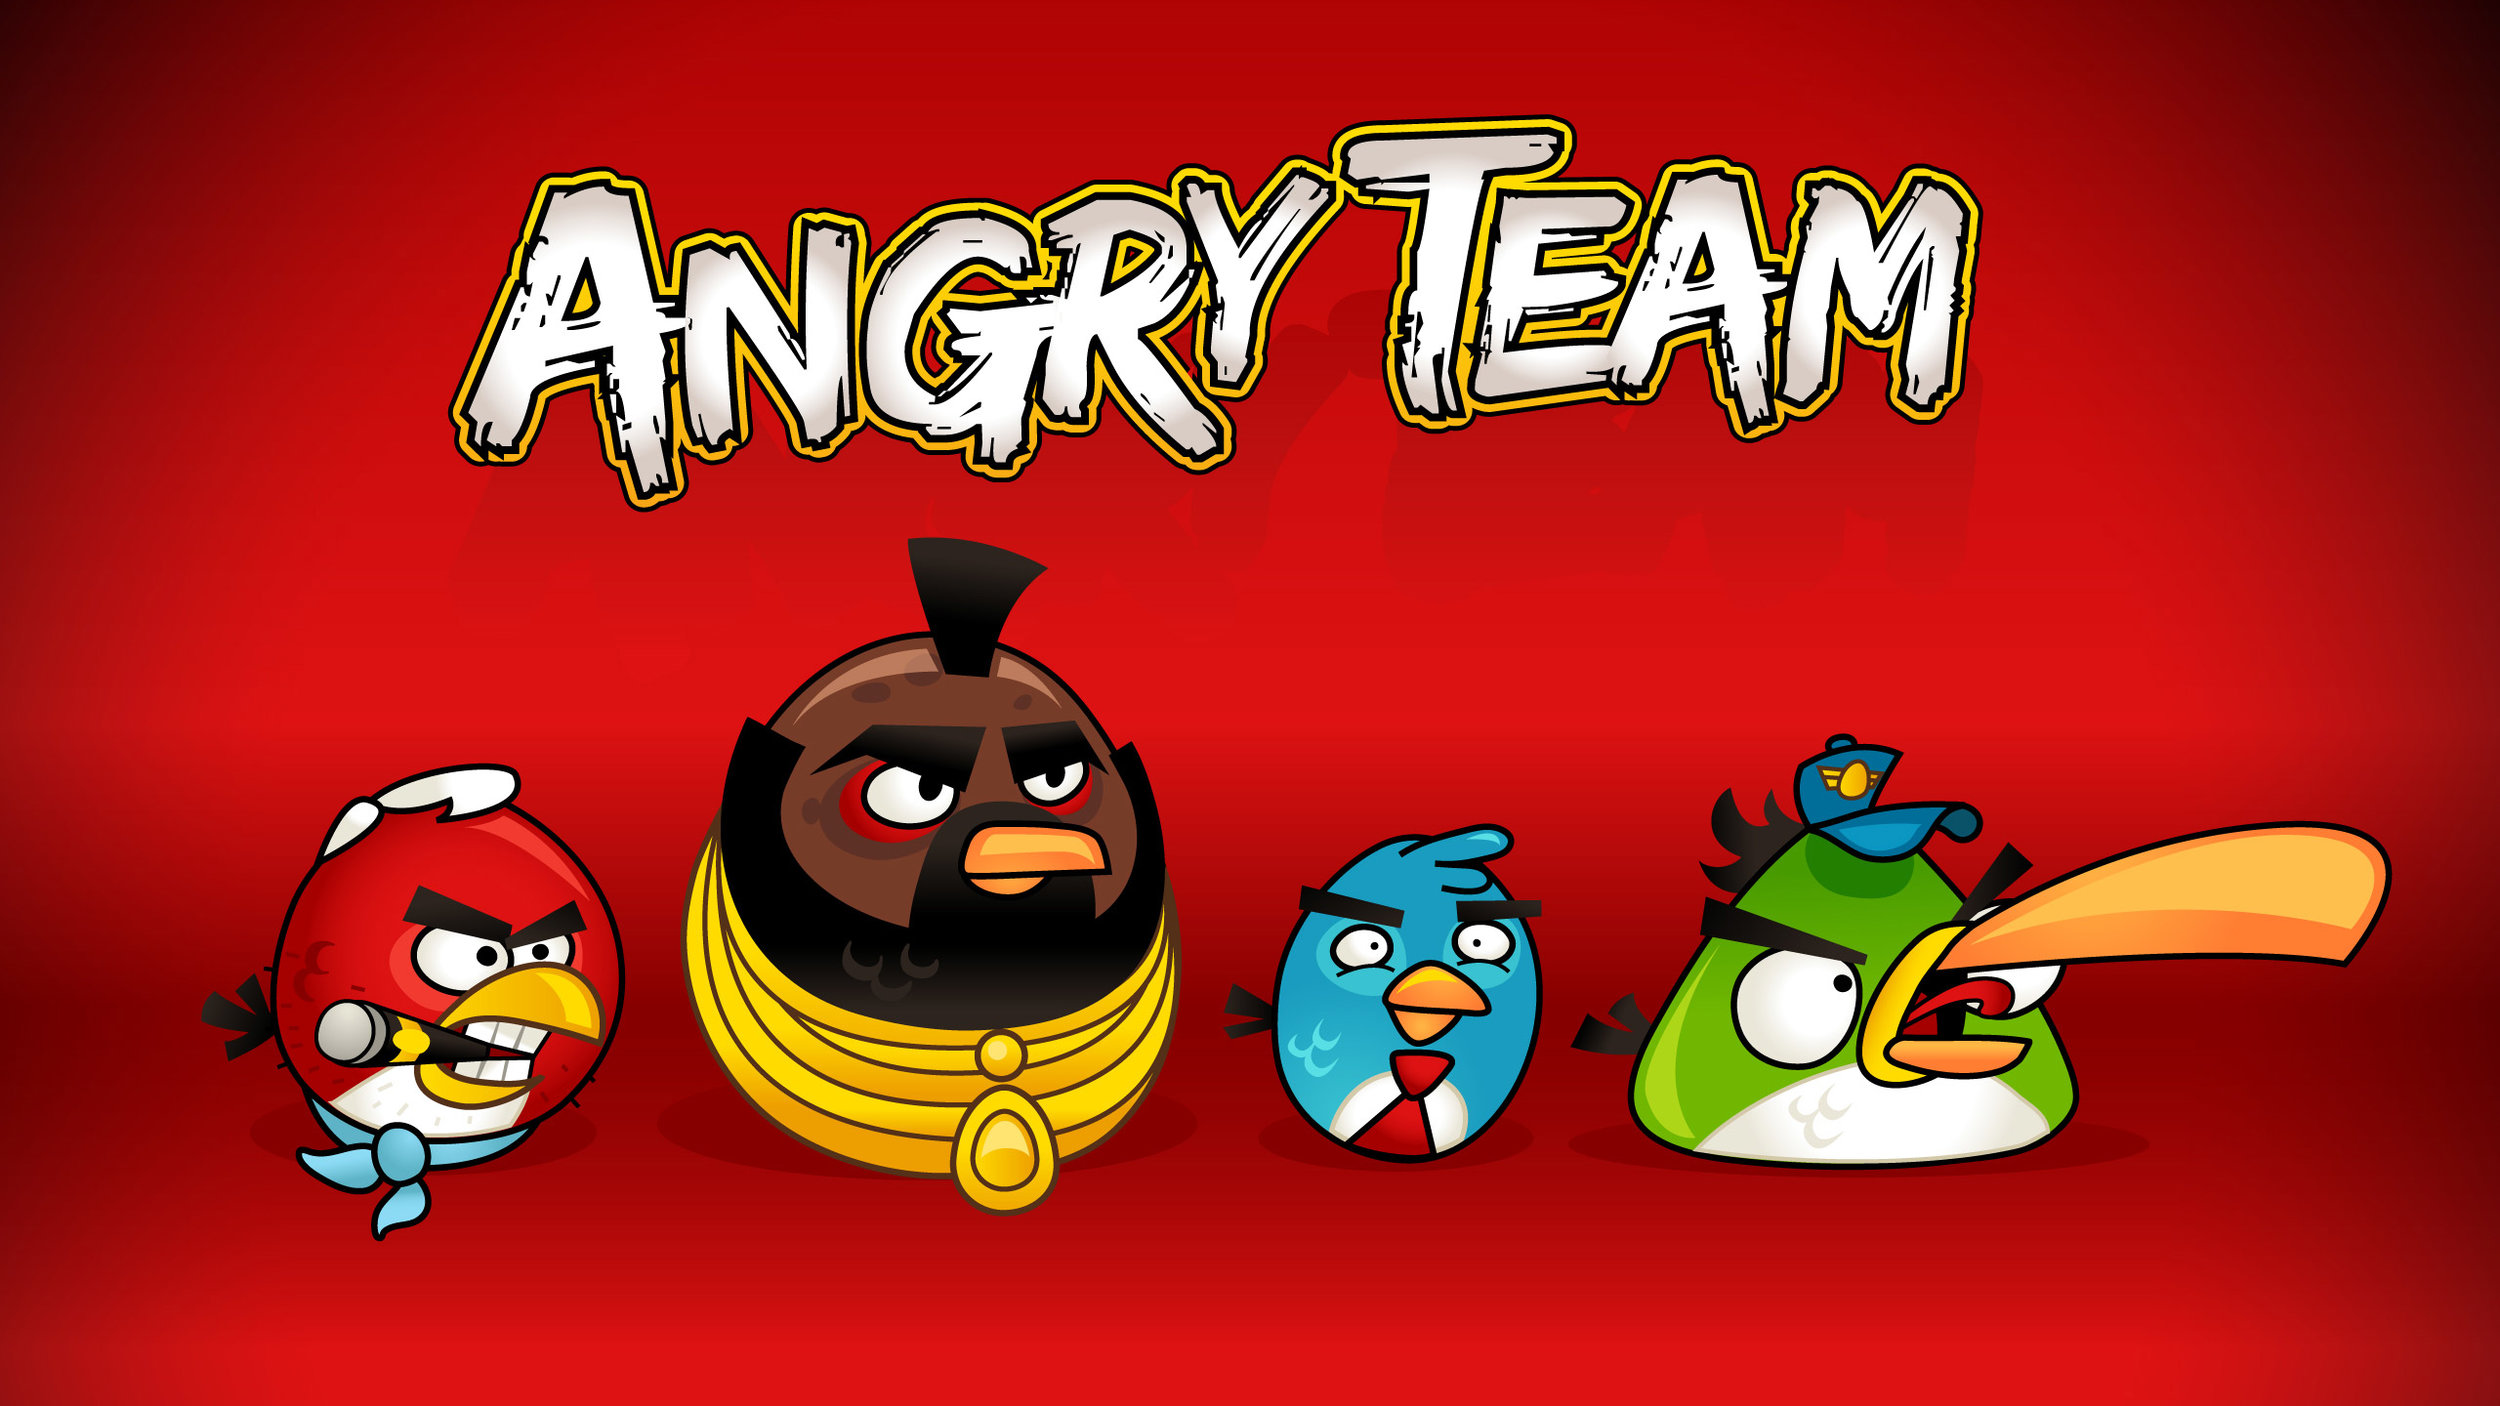 Development-AngryTeam-01.jpg